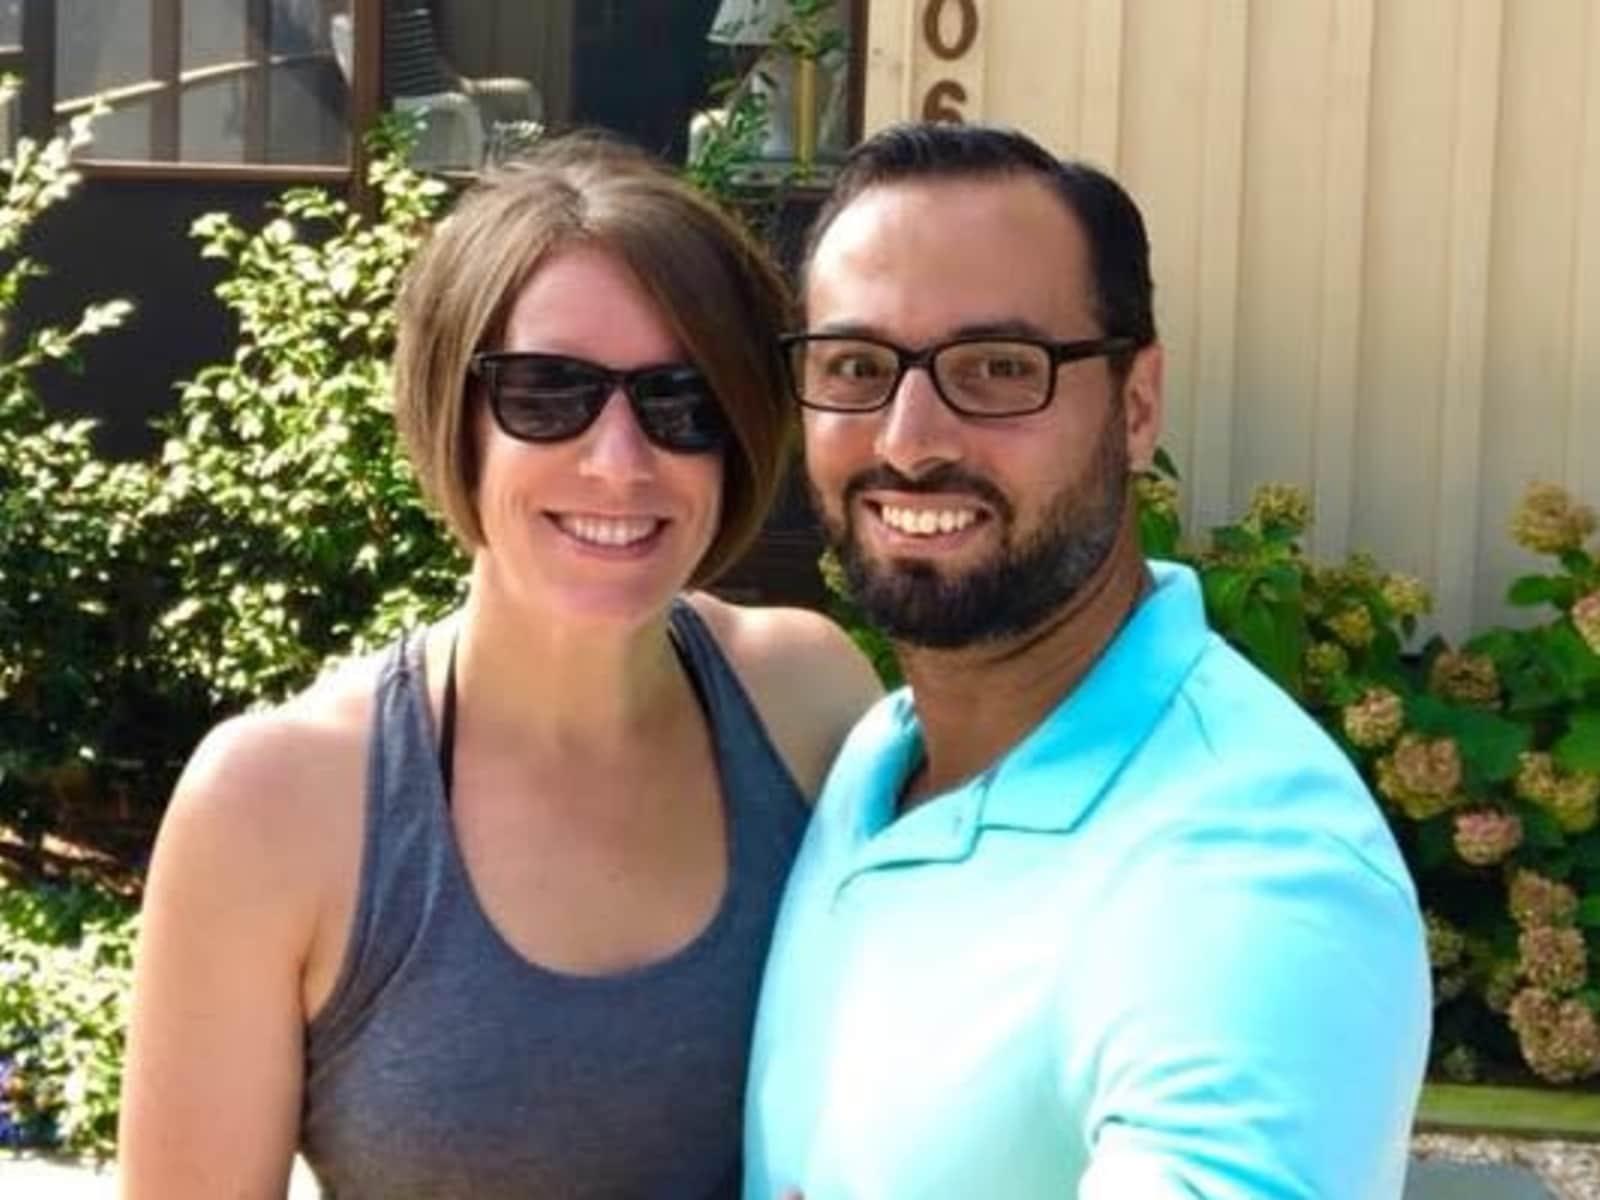 Jenny & daniel & Daniel from Astoria, New York, United States